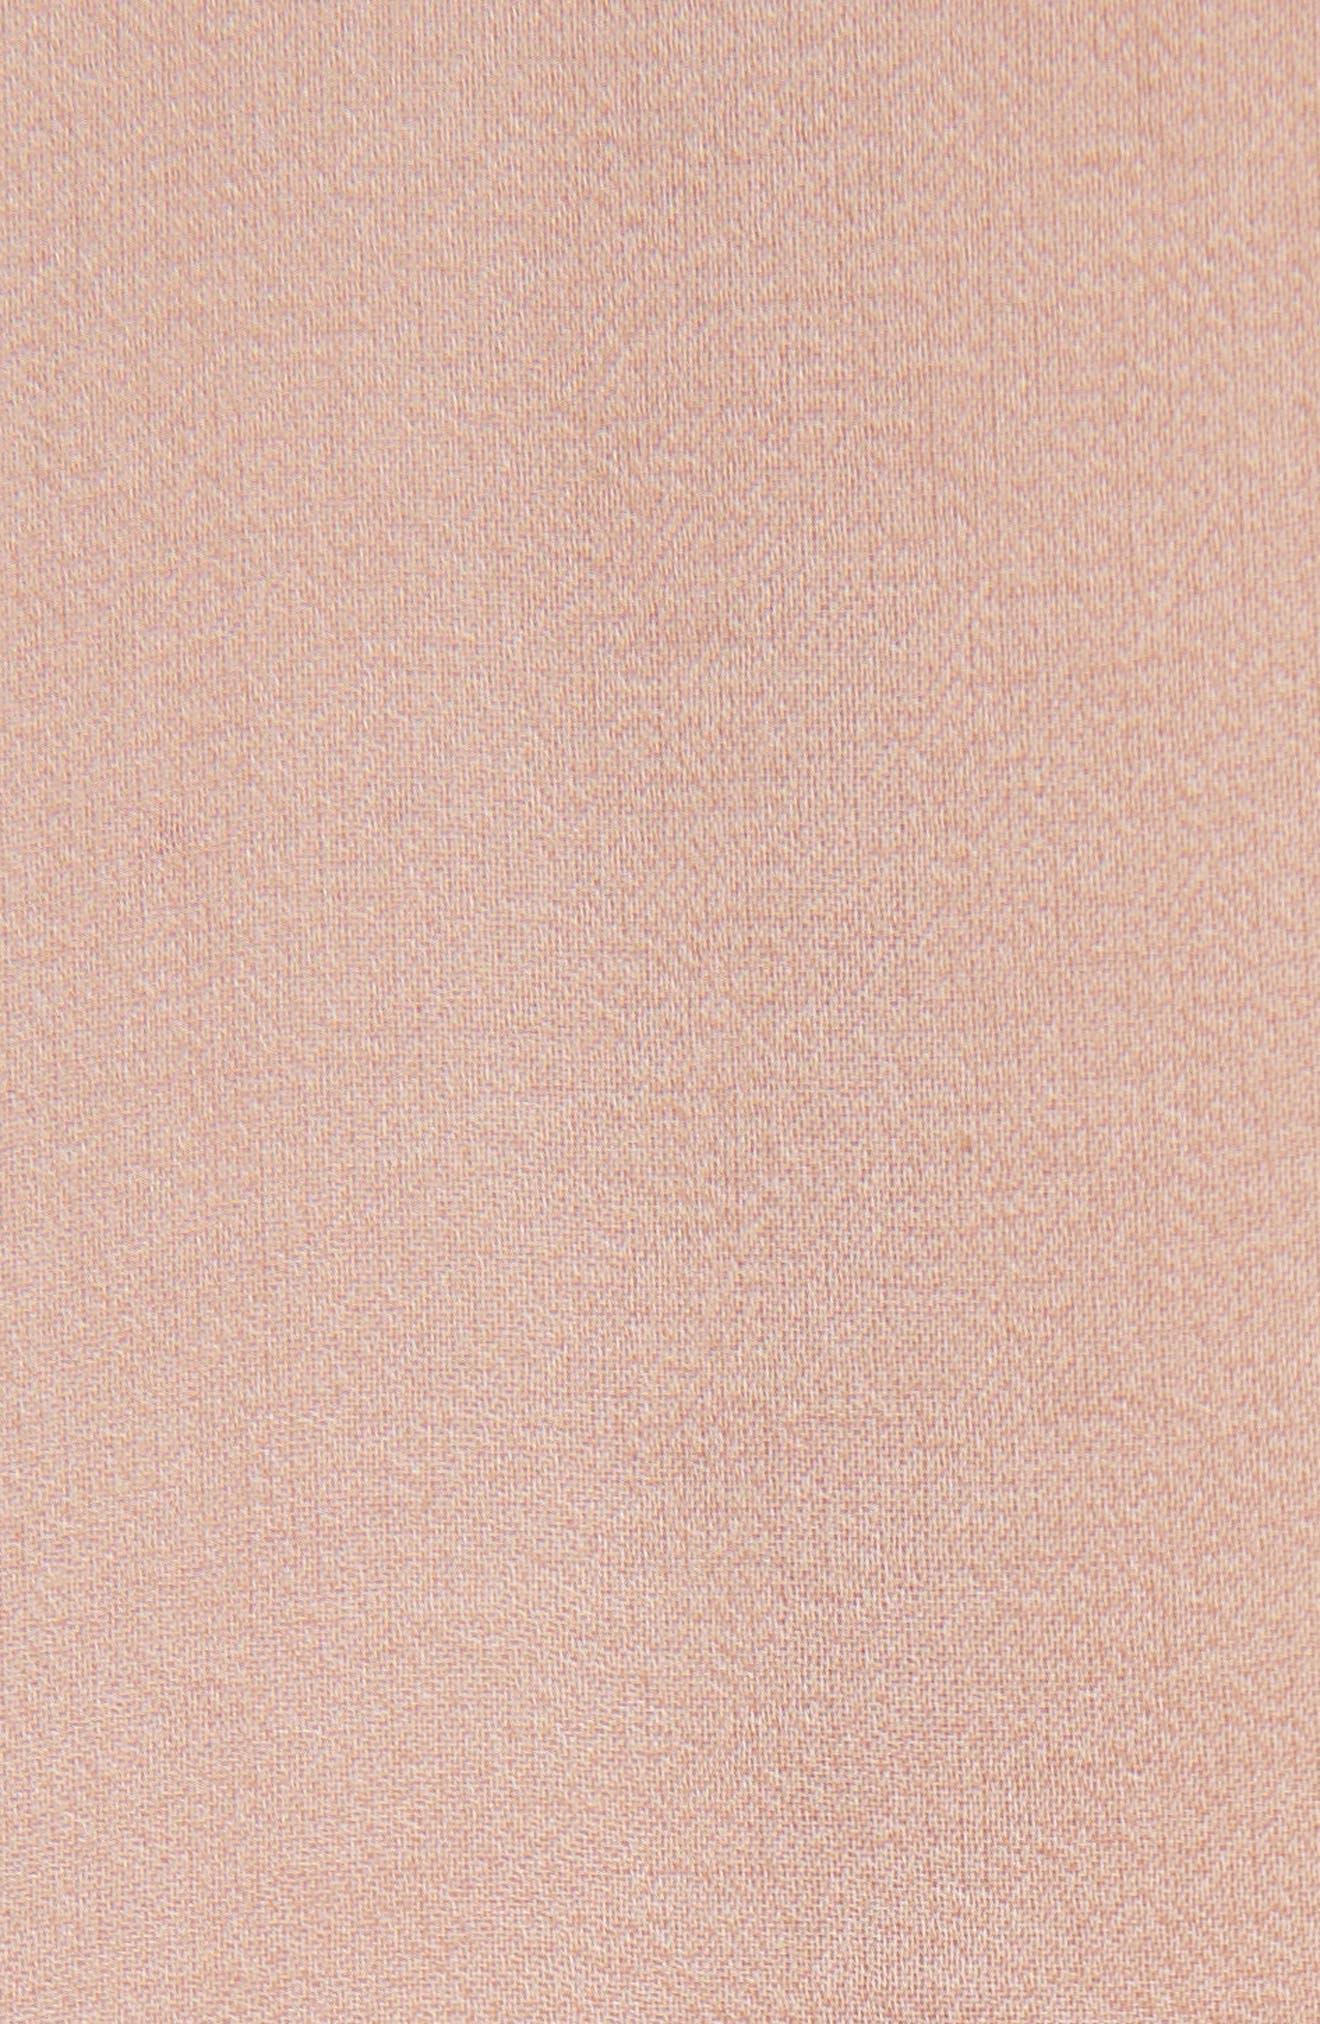 Nº21 Chiffon Back Sweatshirt,                             Alternate thumbnail 5, color,                             650